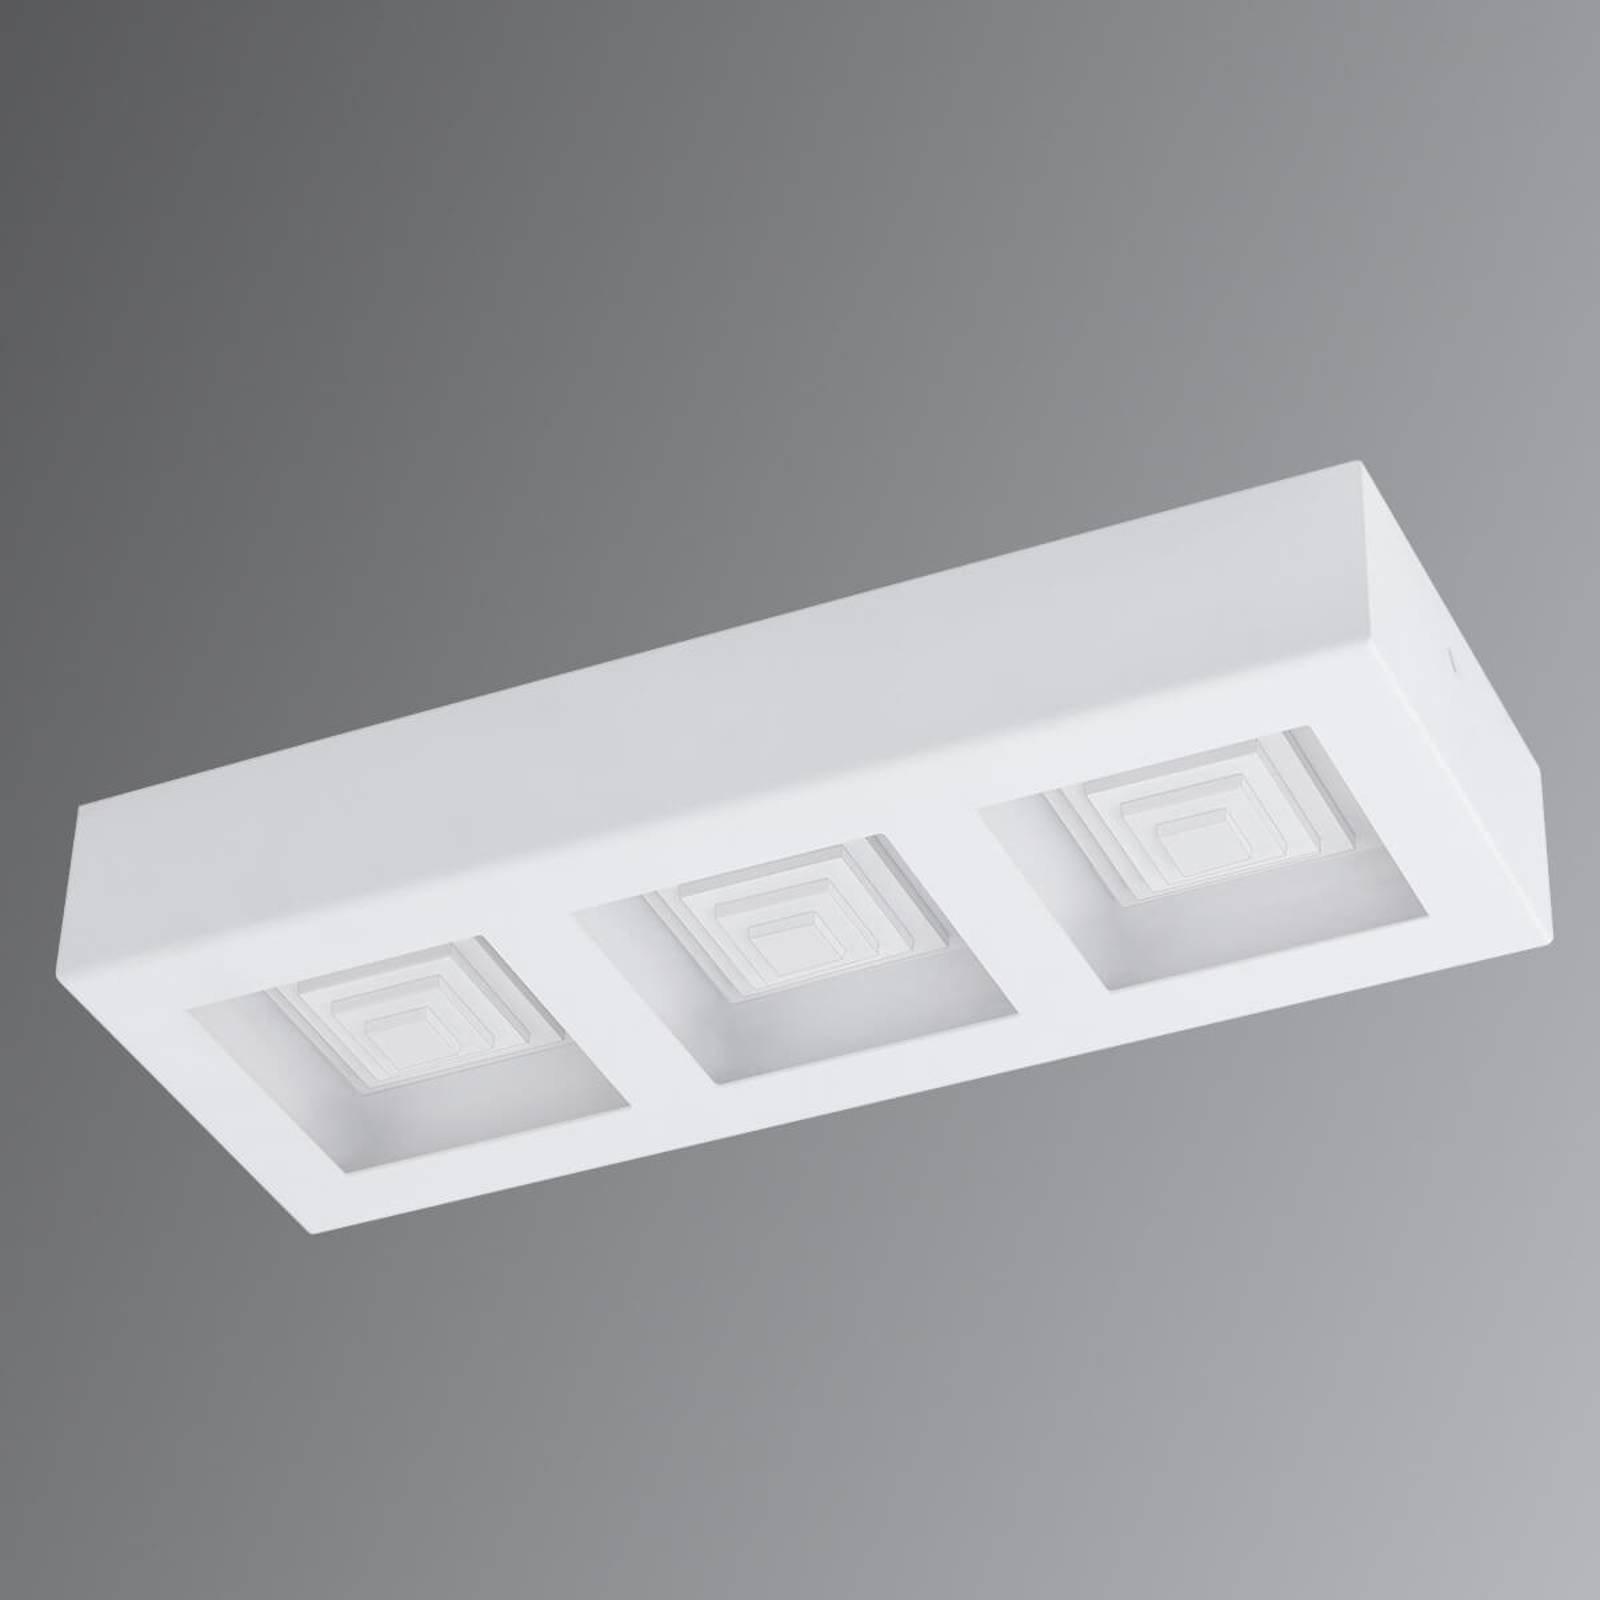 Ferreros - LED-taklampe 3 lyskilder i hvit